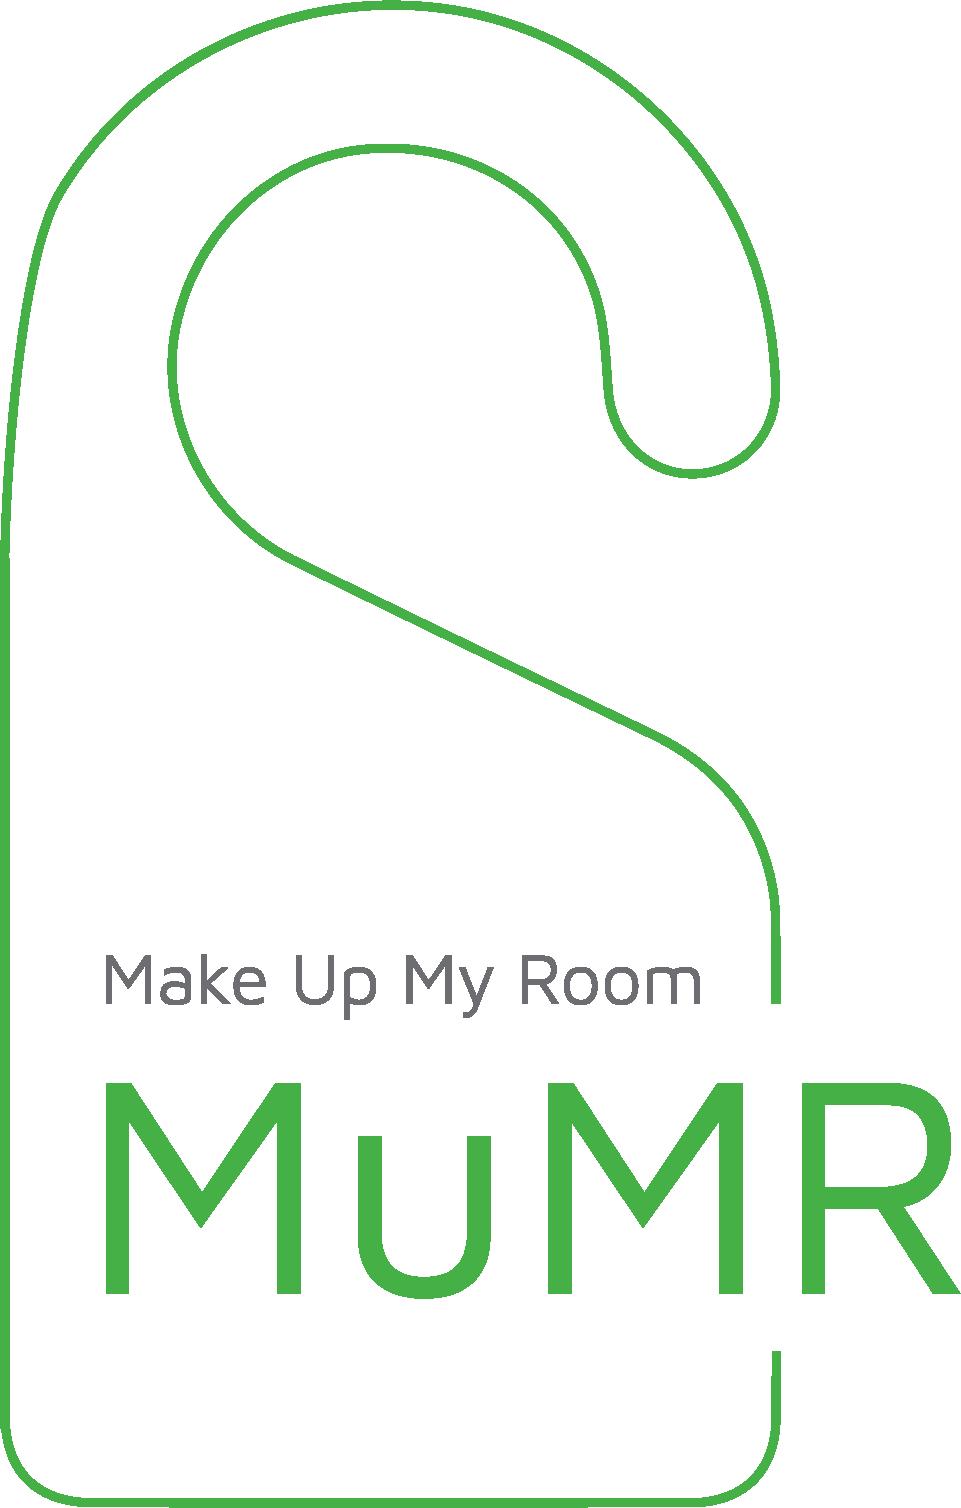 Make Up My Room